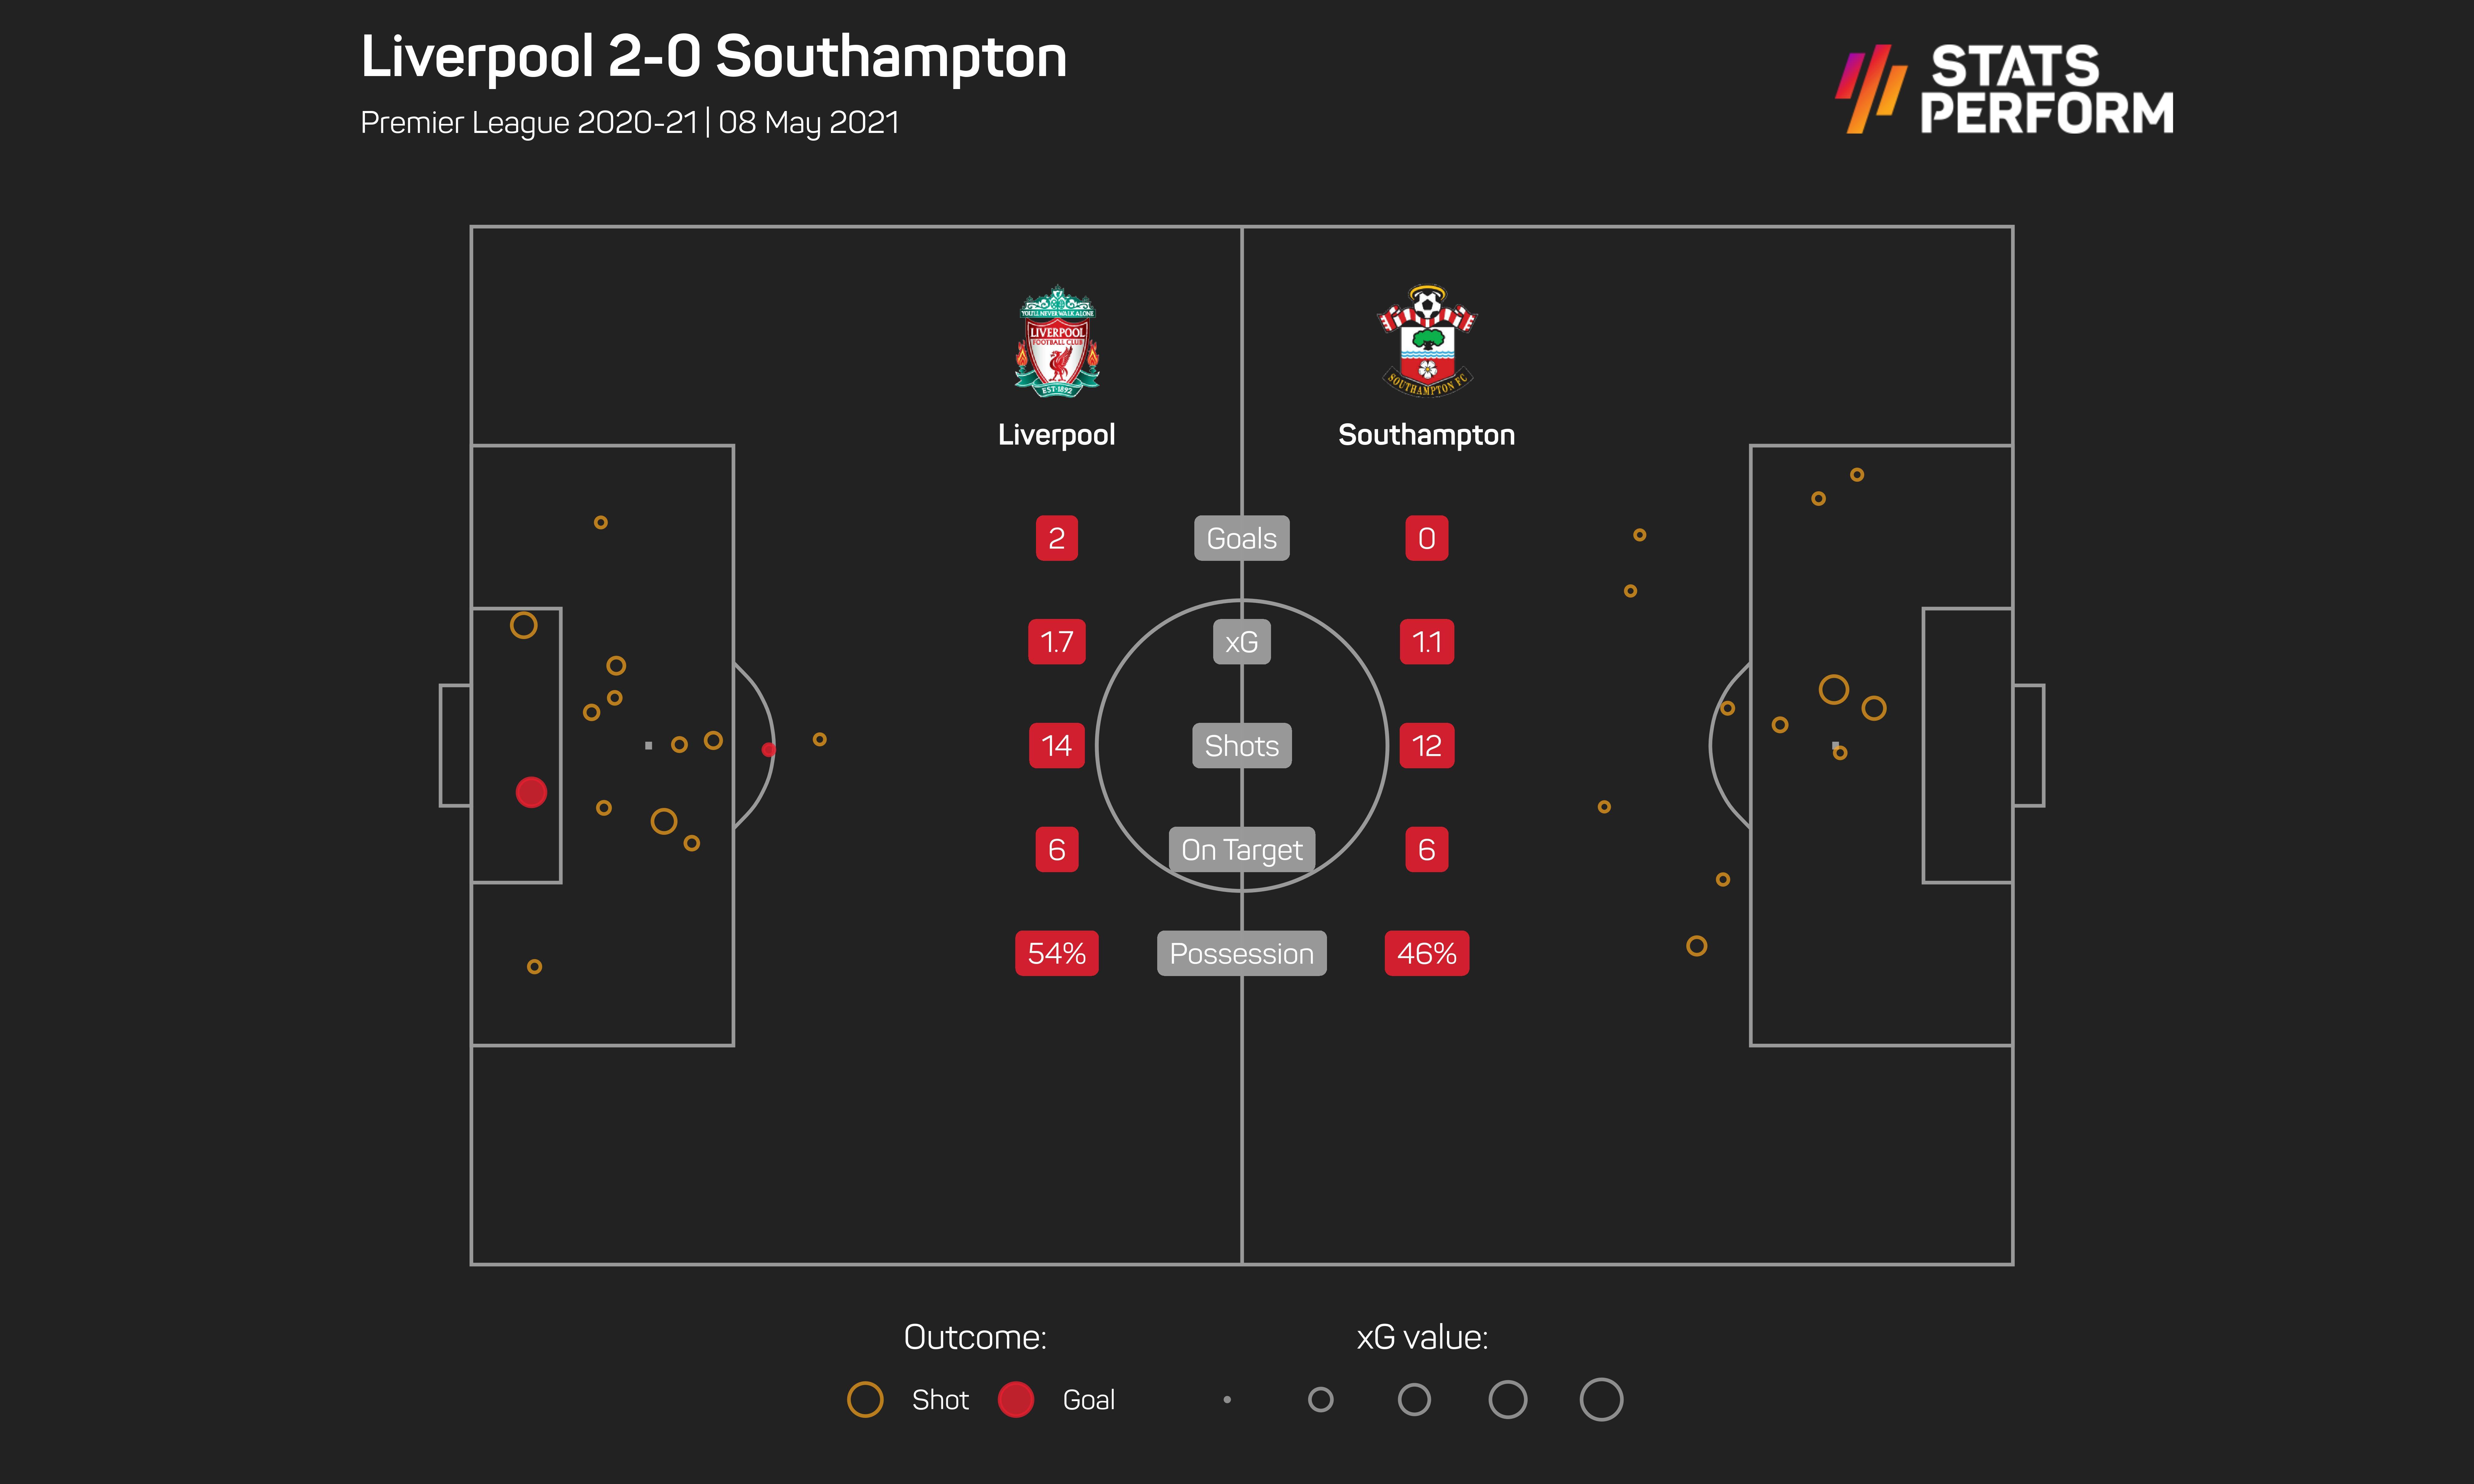 Liverpool v Southampton match summary w/xG